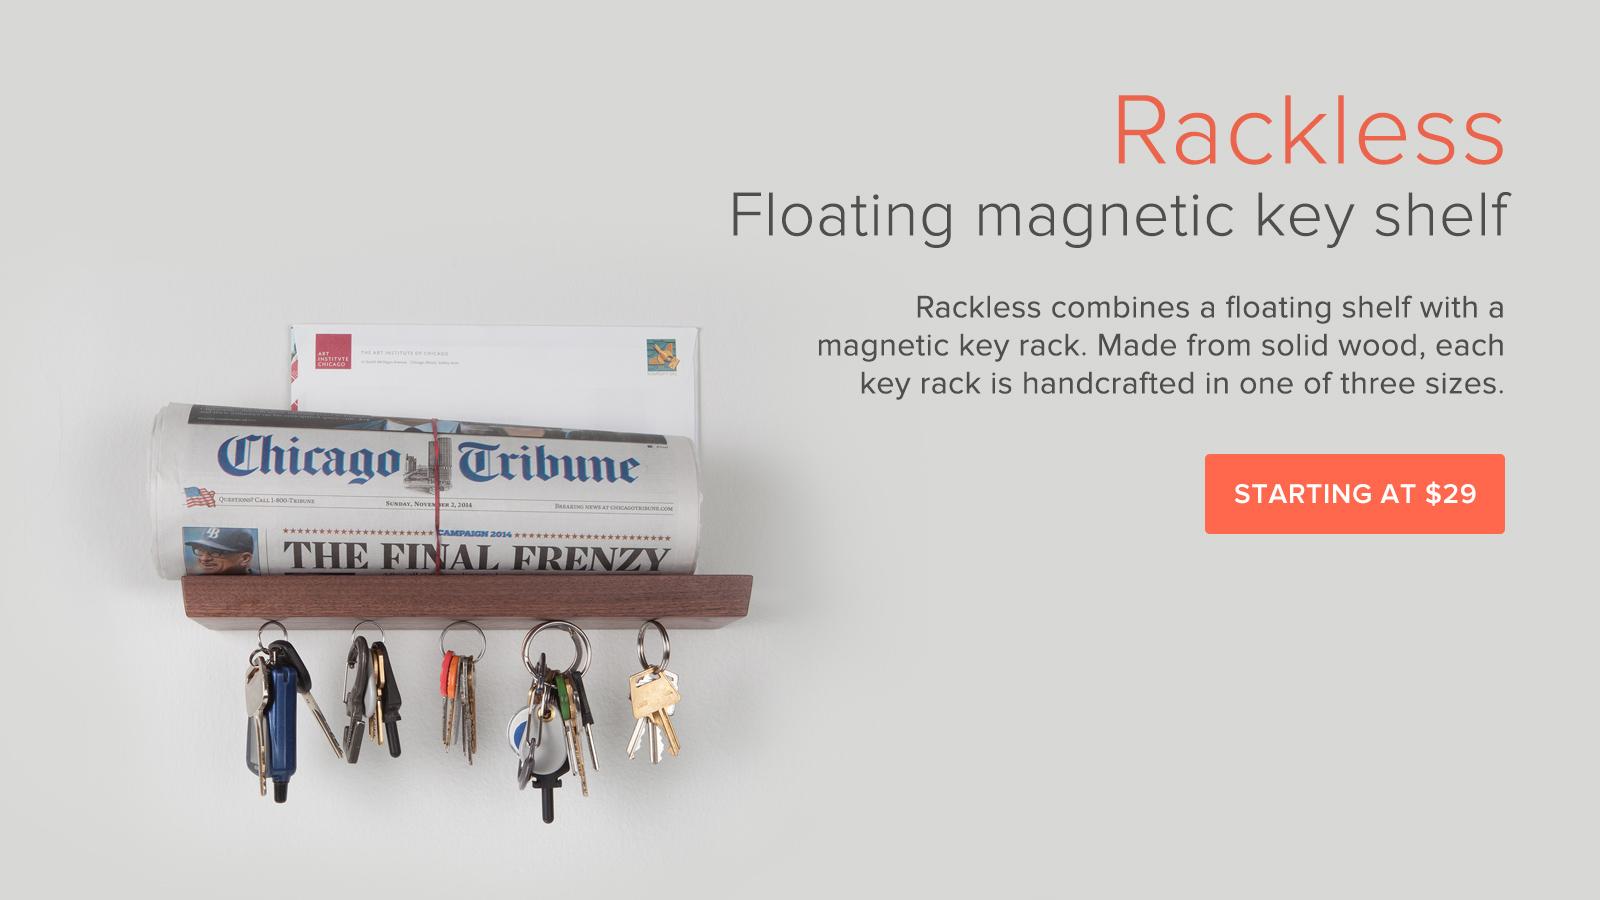 Floating magnetic key shelf